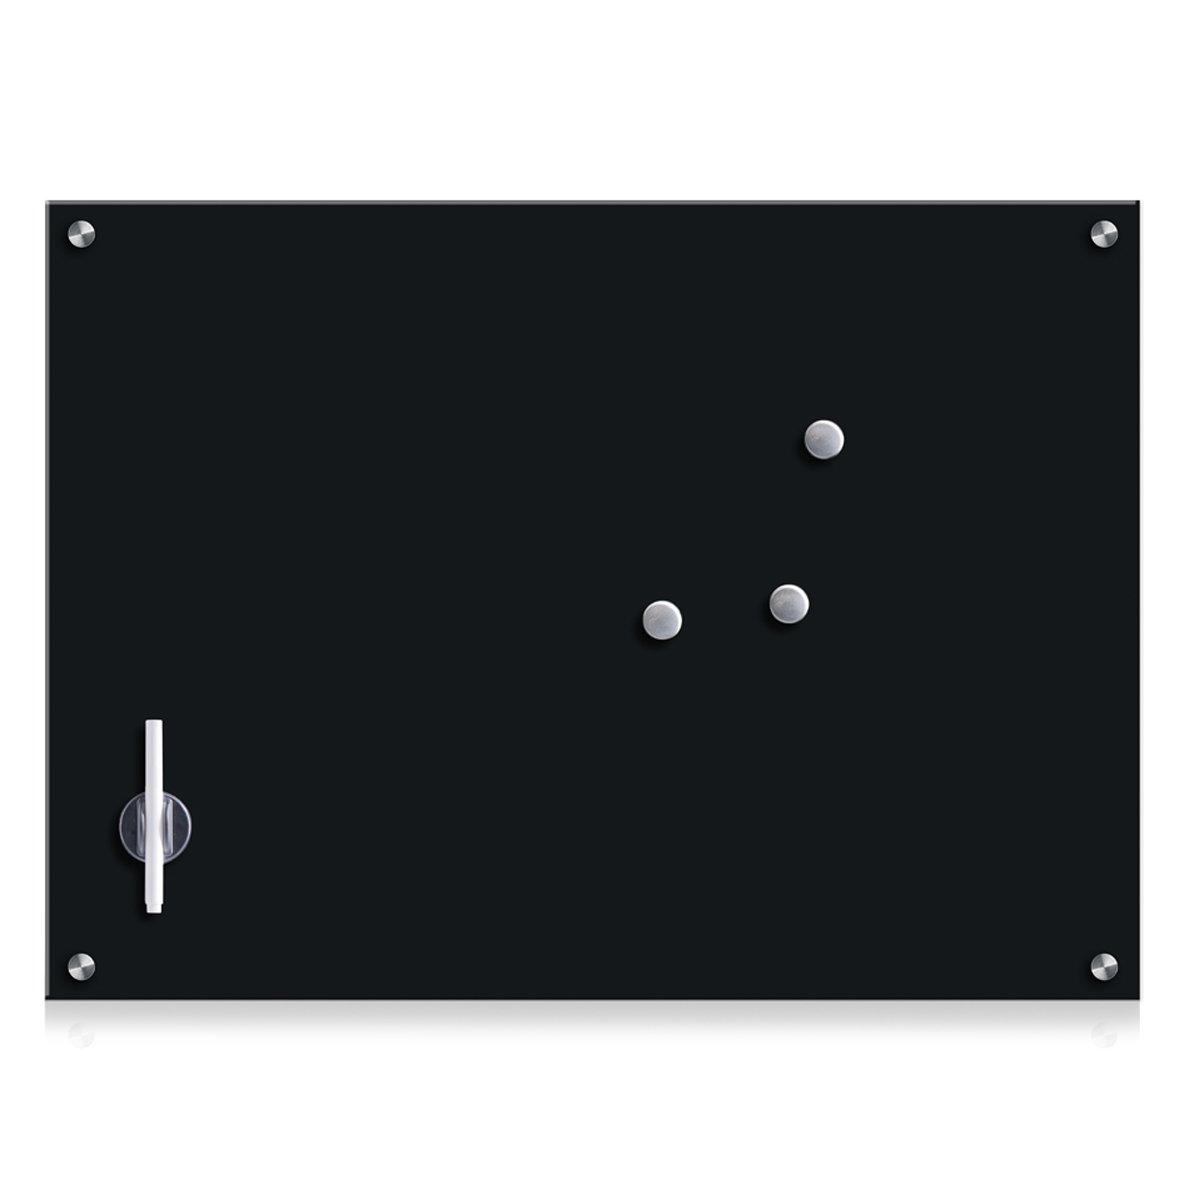 Zeller Glass Memo Board, Black